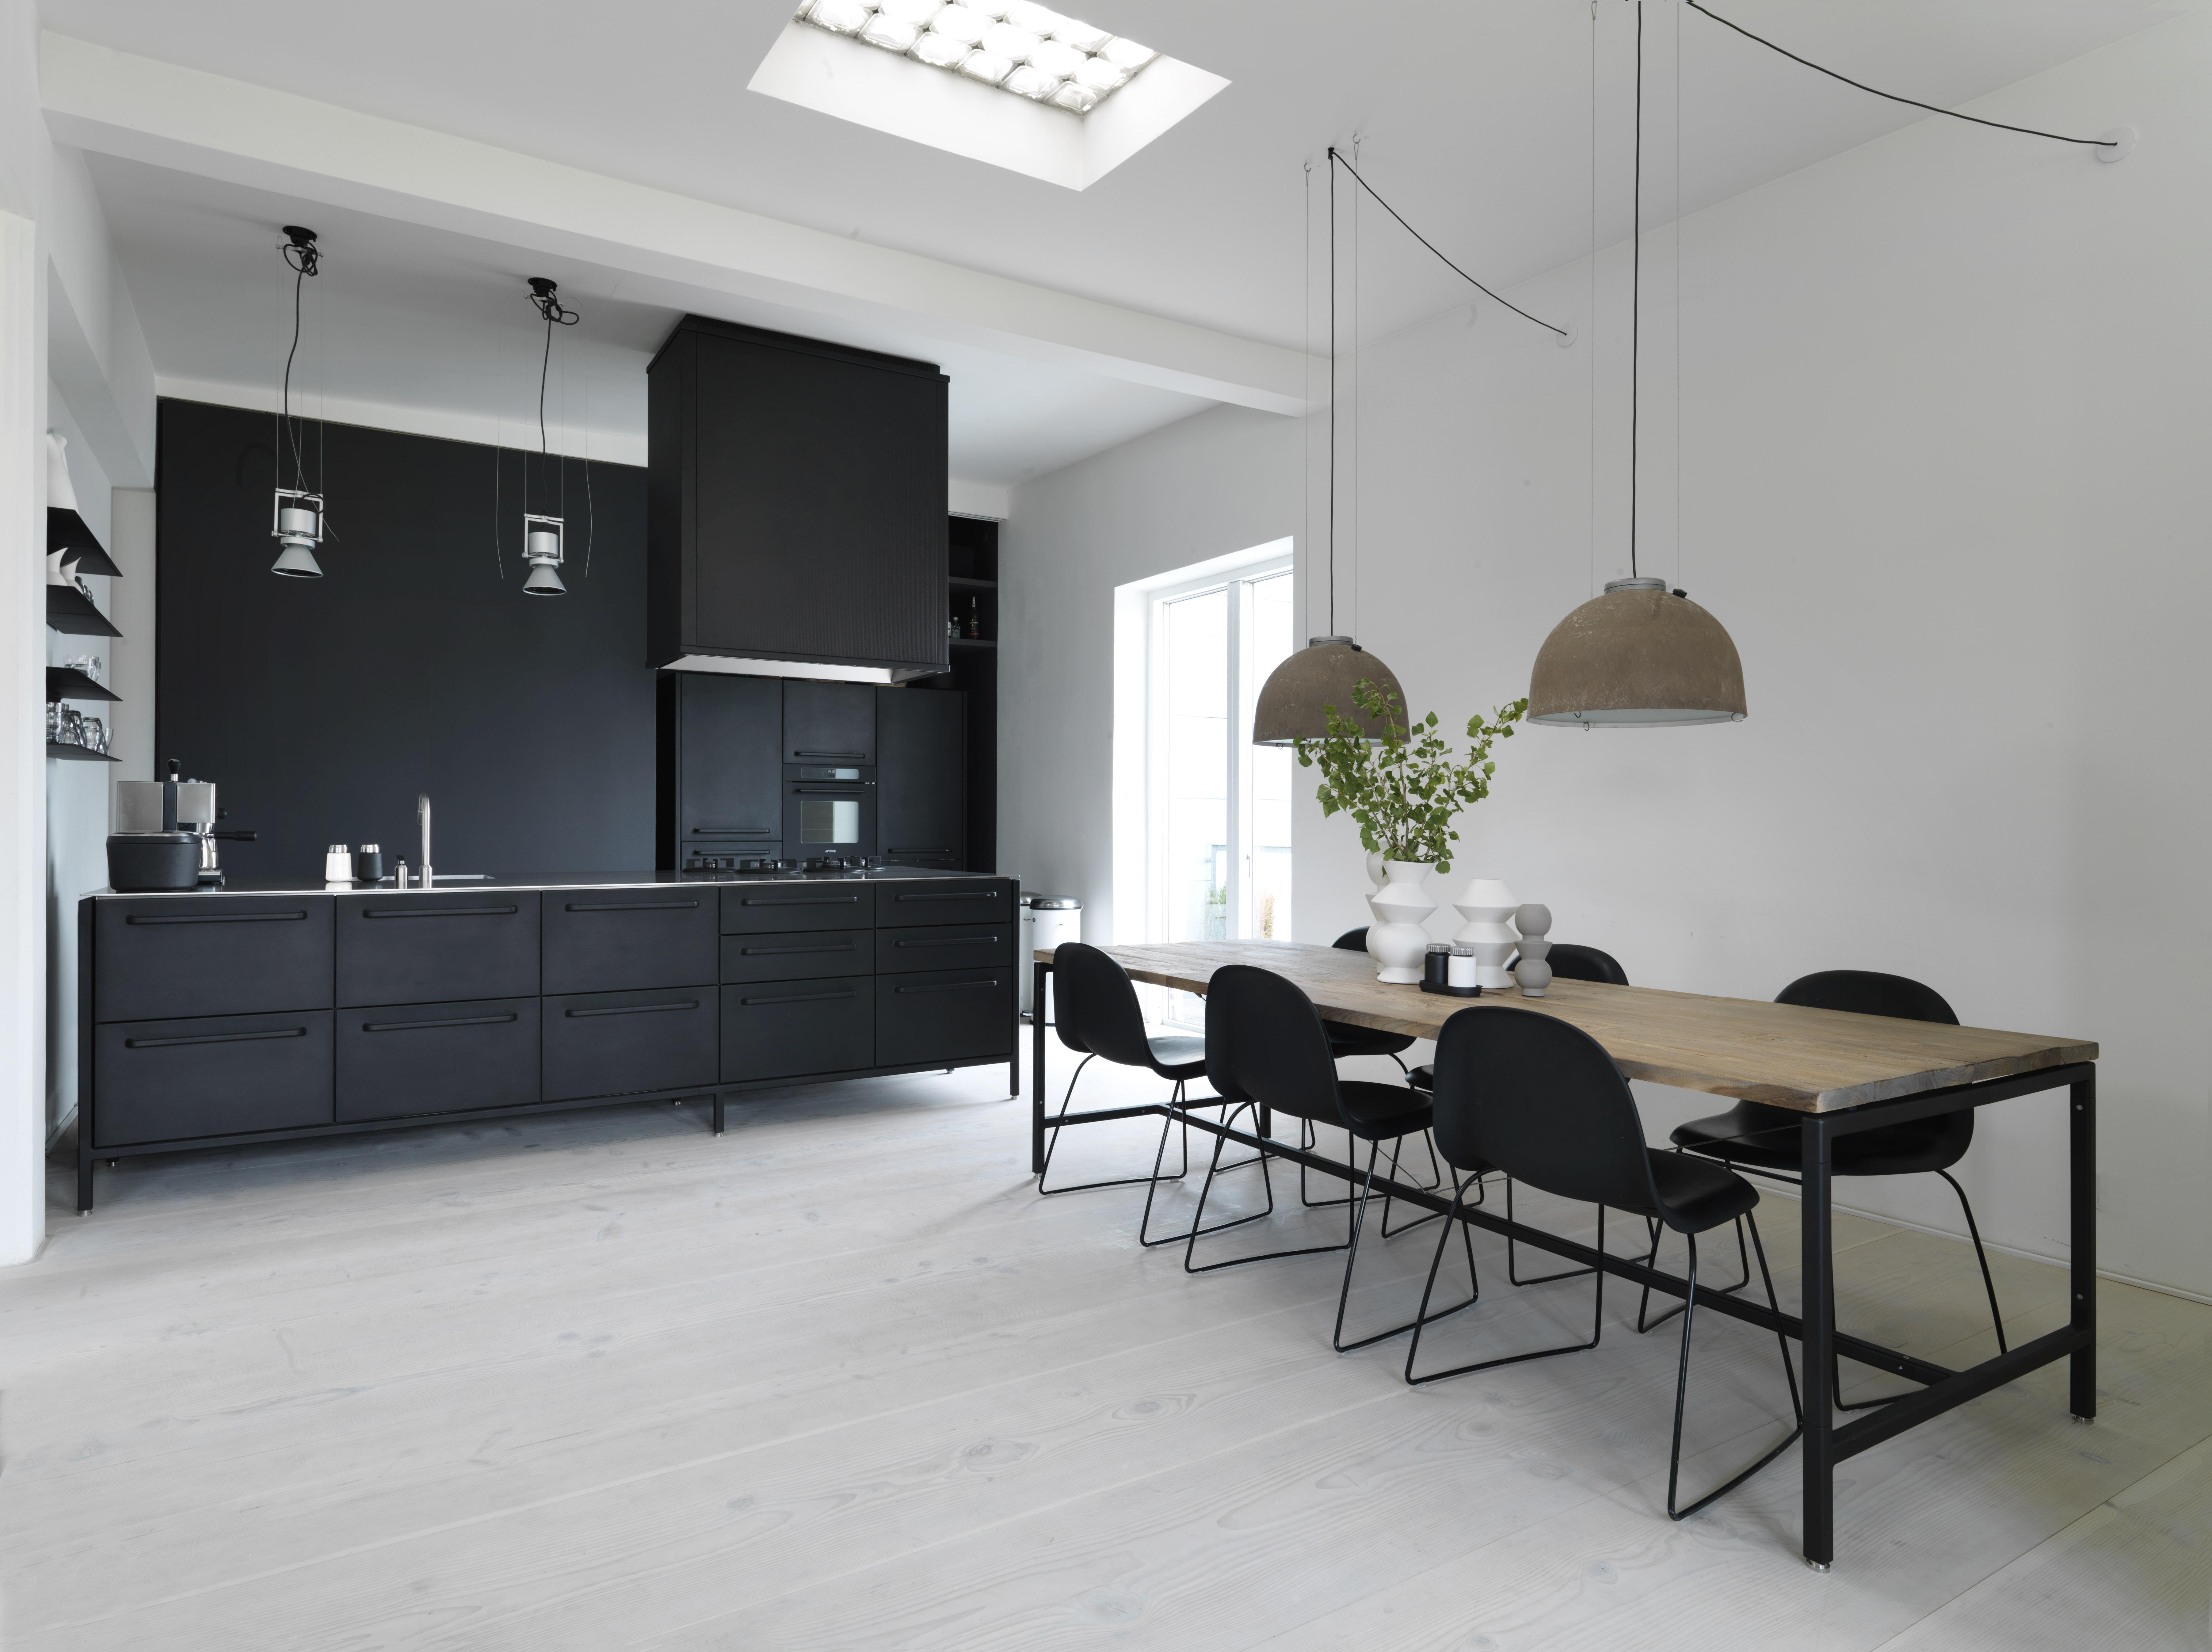 I Wish I Lived Here A New York Style Loft In Copenhagen